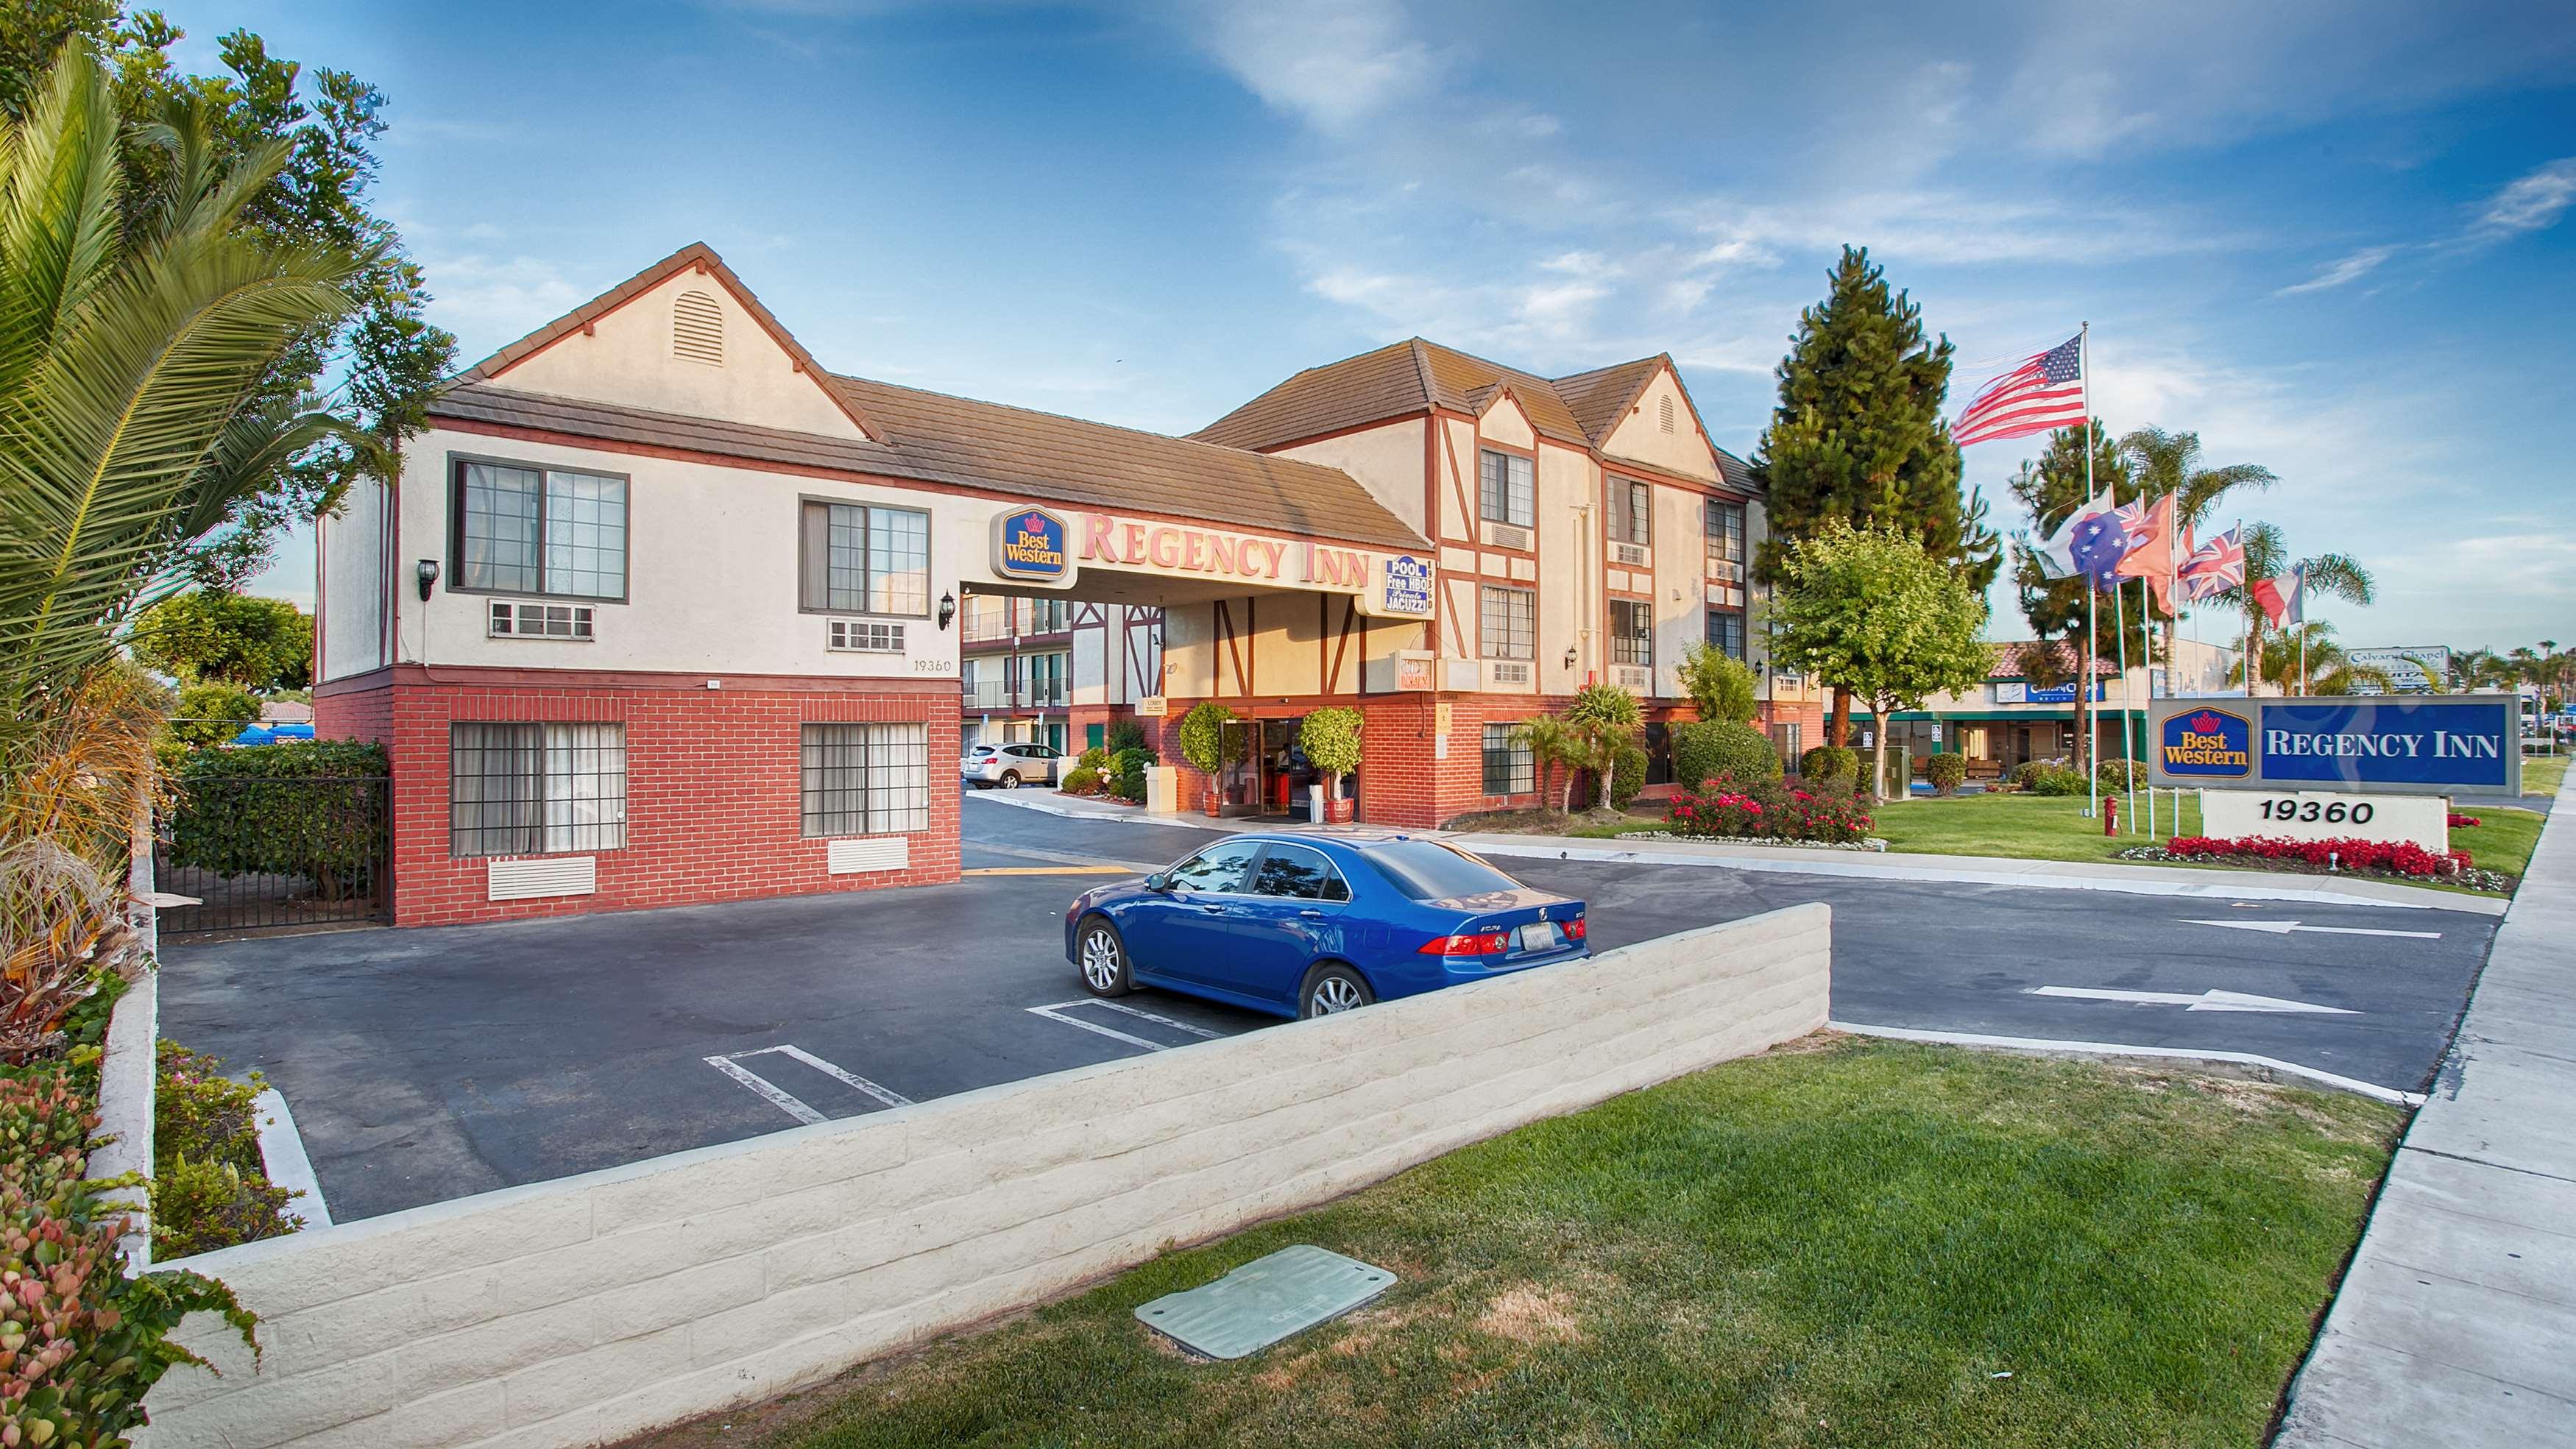 Motels Huntington Beach Ca